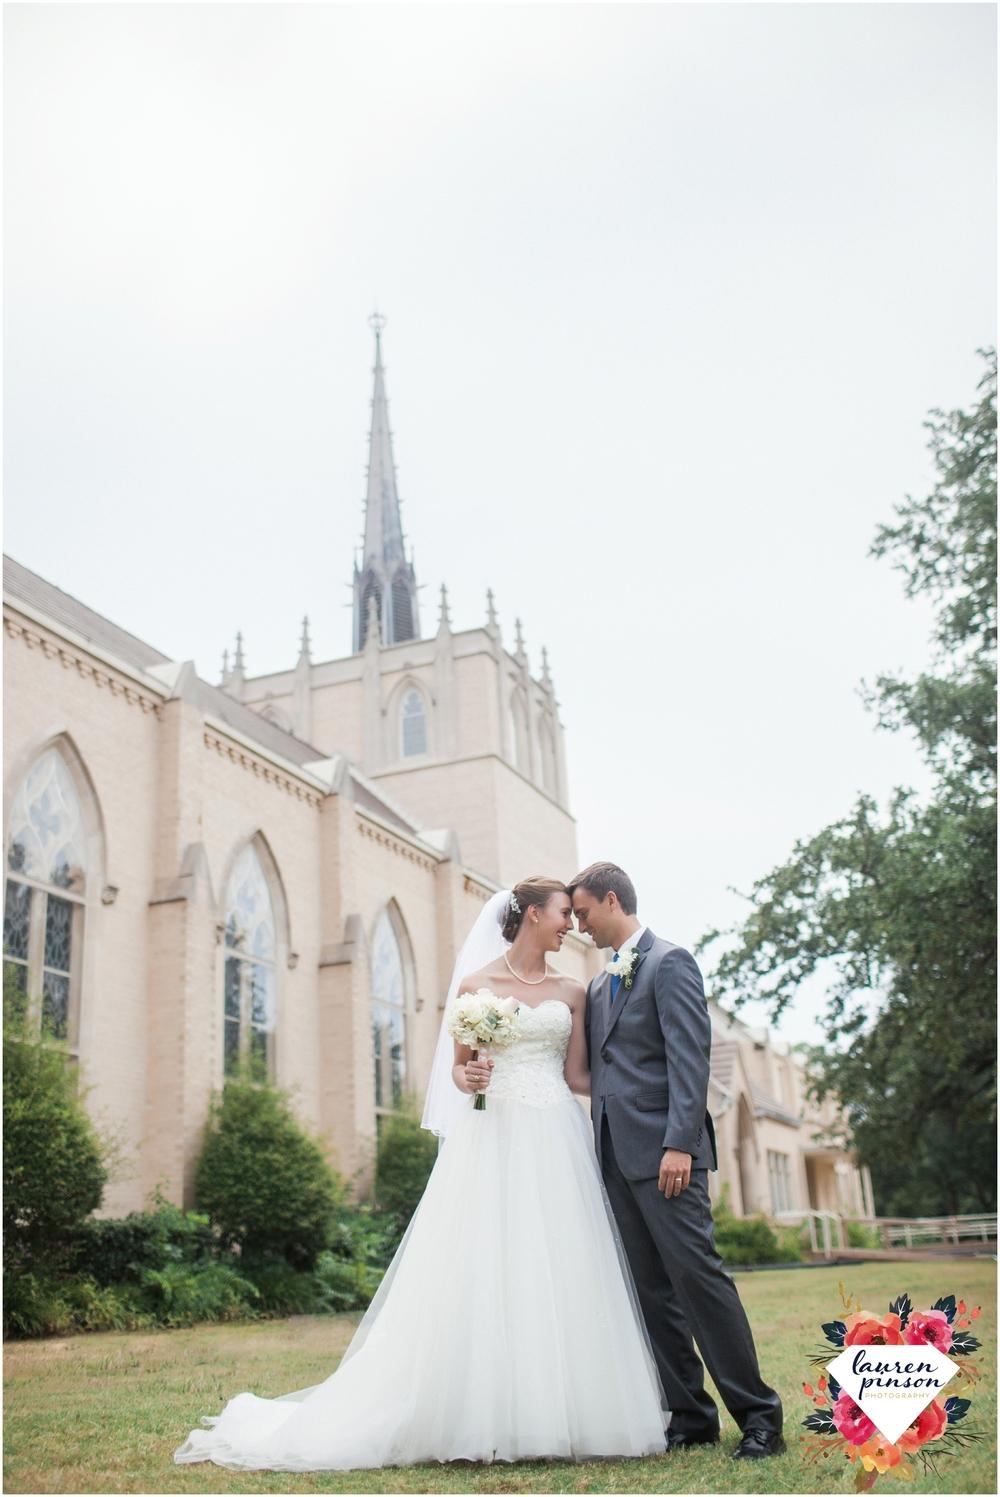 wichita-falls-wedding-photography-at-fain-presbyterian-church-and-the-wellington-timeless-classic-modern-photographer_1141.jpg